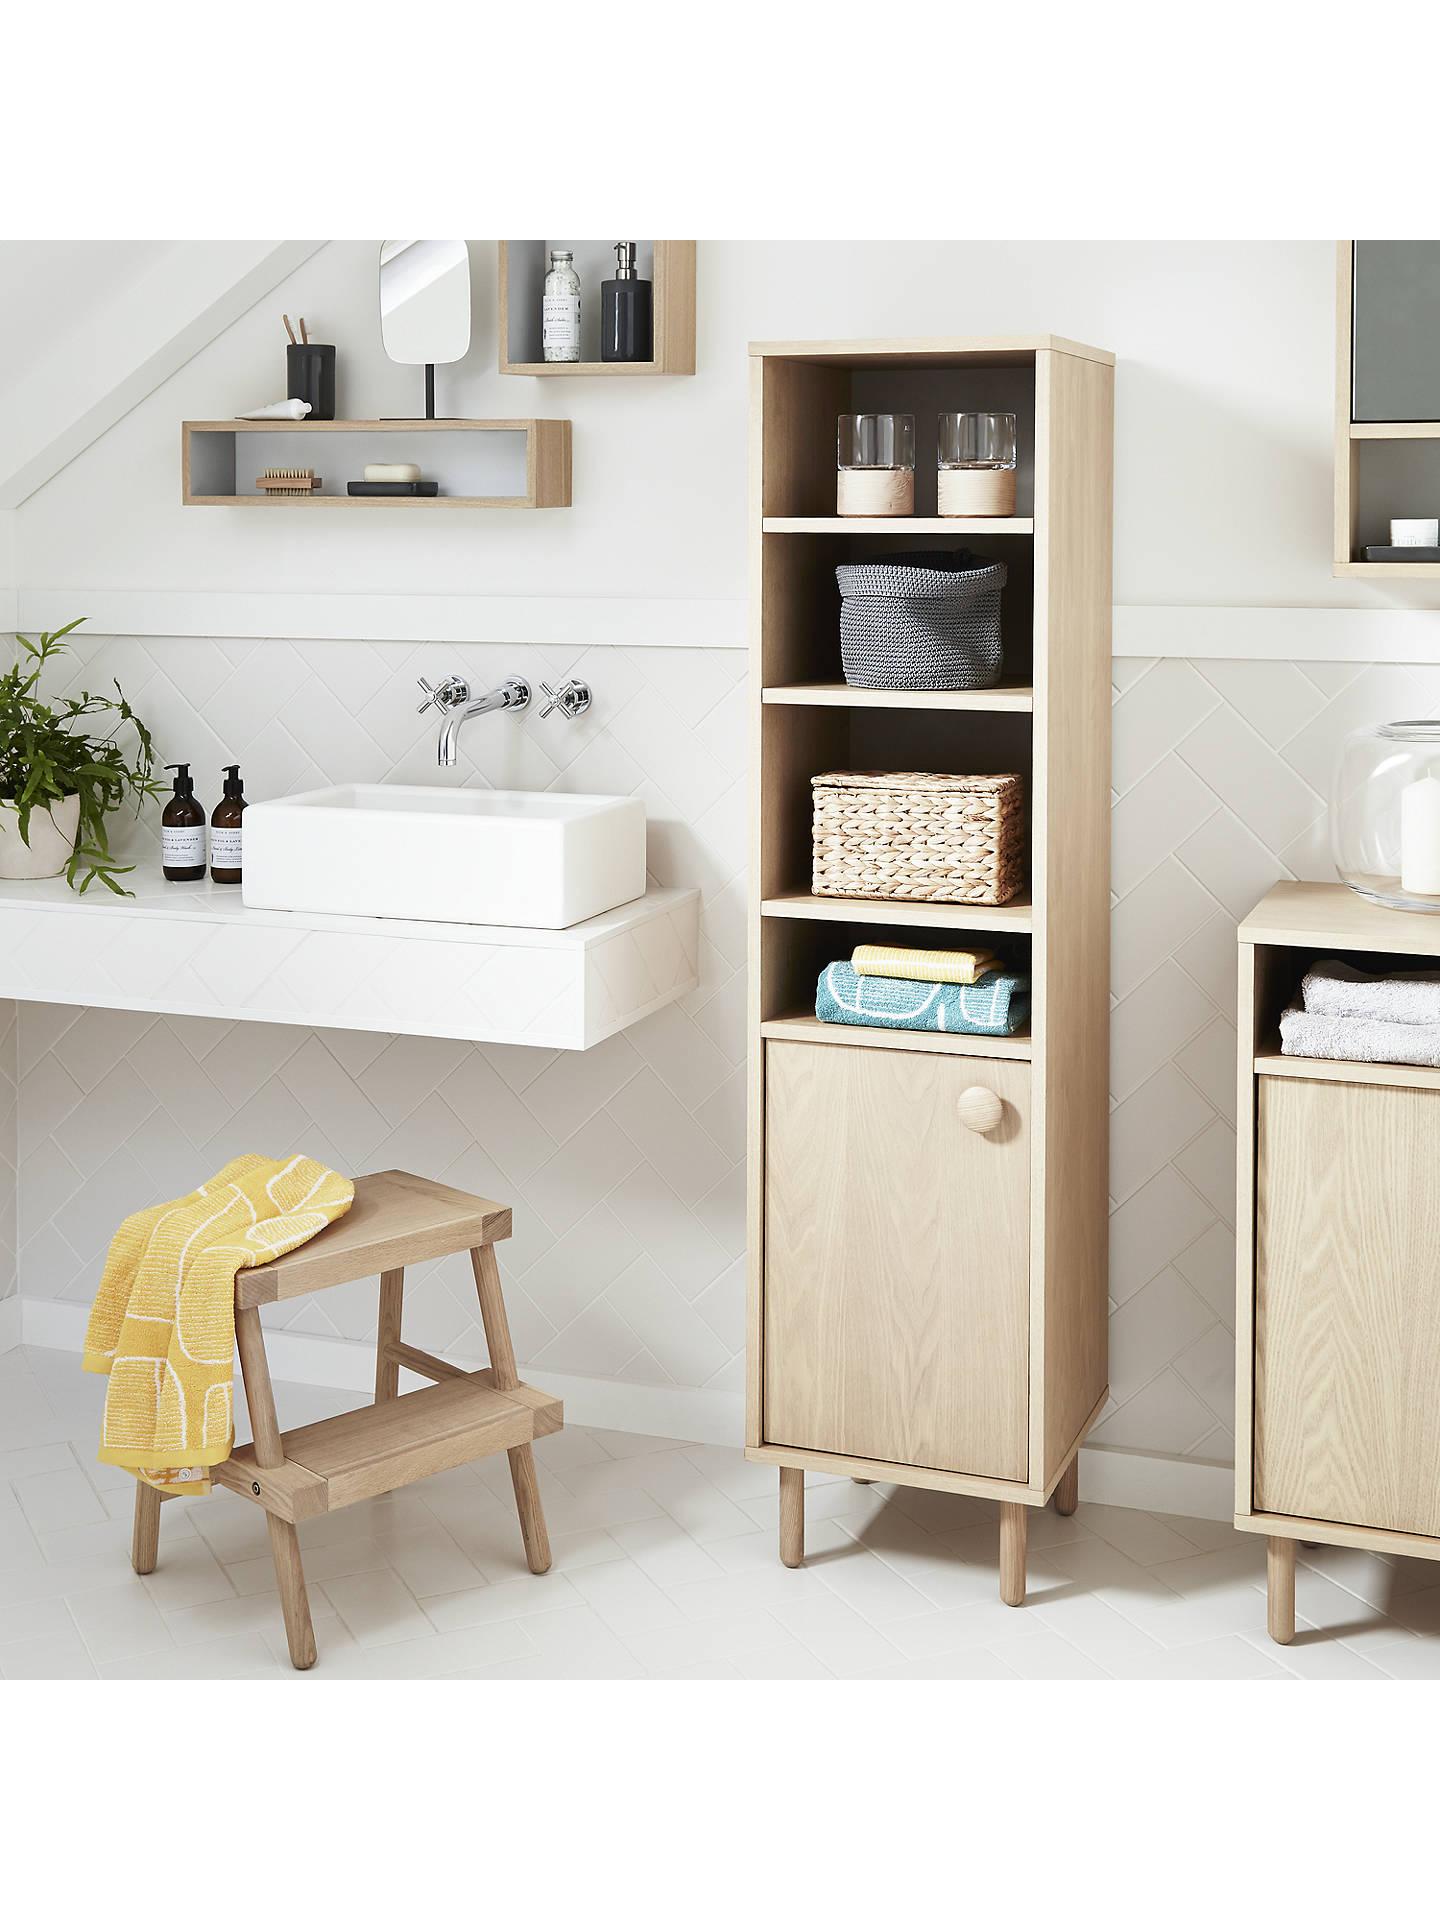 design project  john lewis  bathroom stool  john